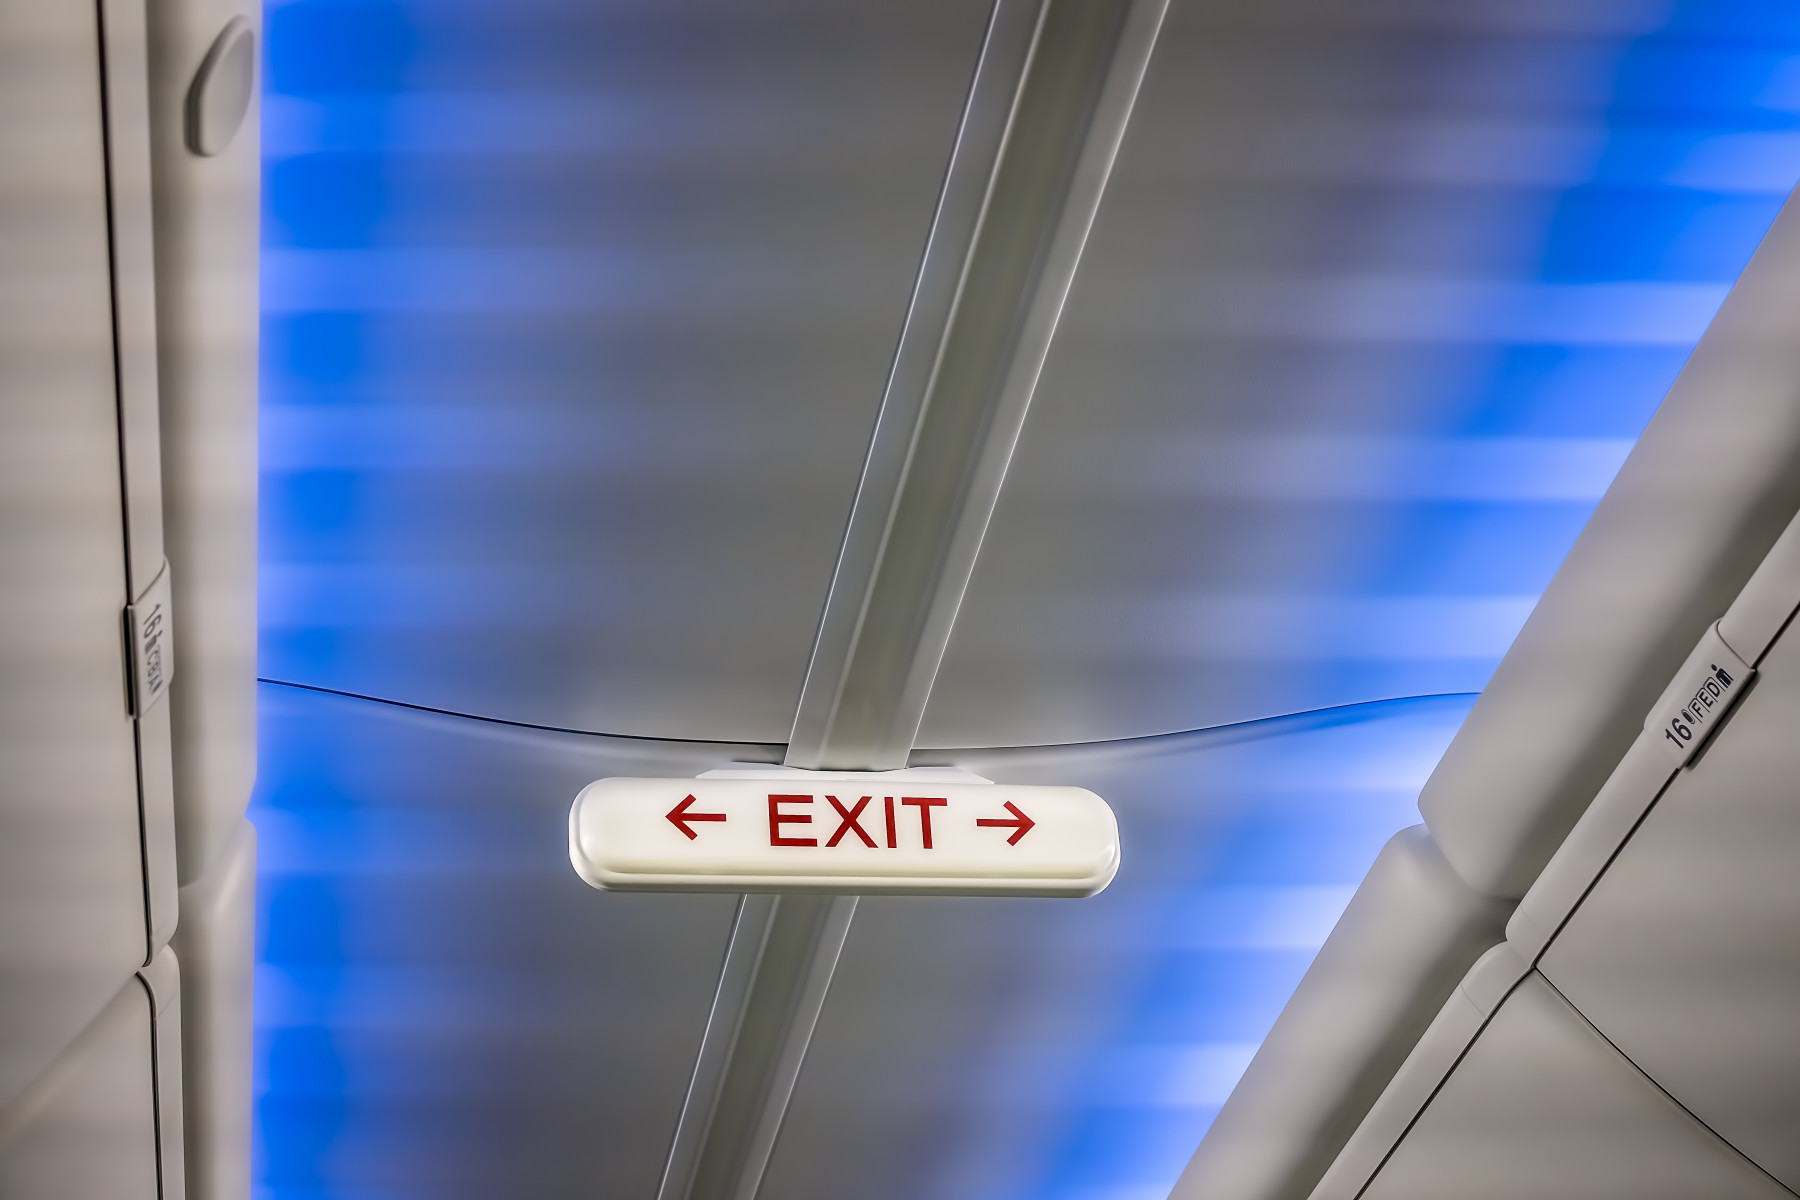 emergency lights - Tim Kyle